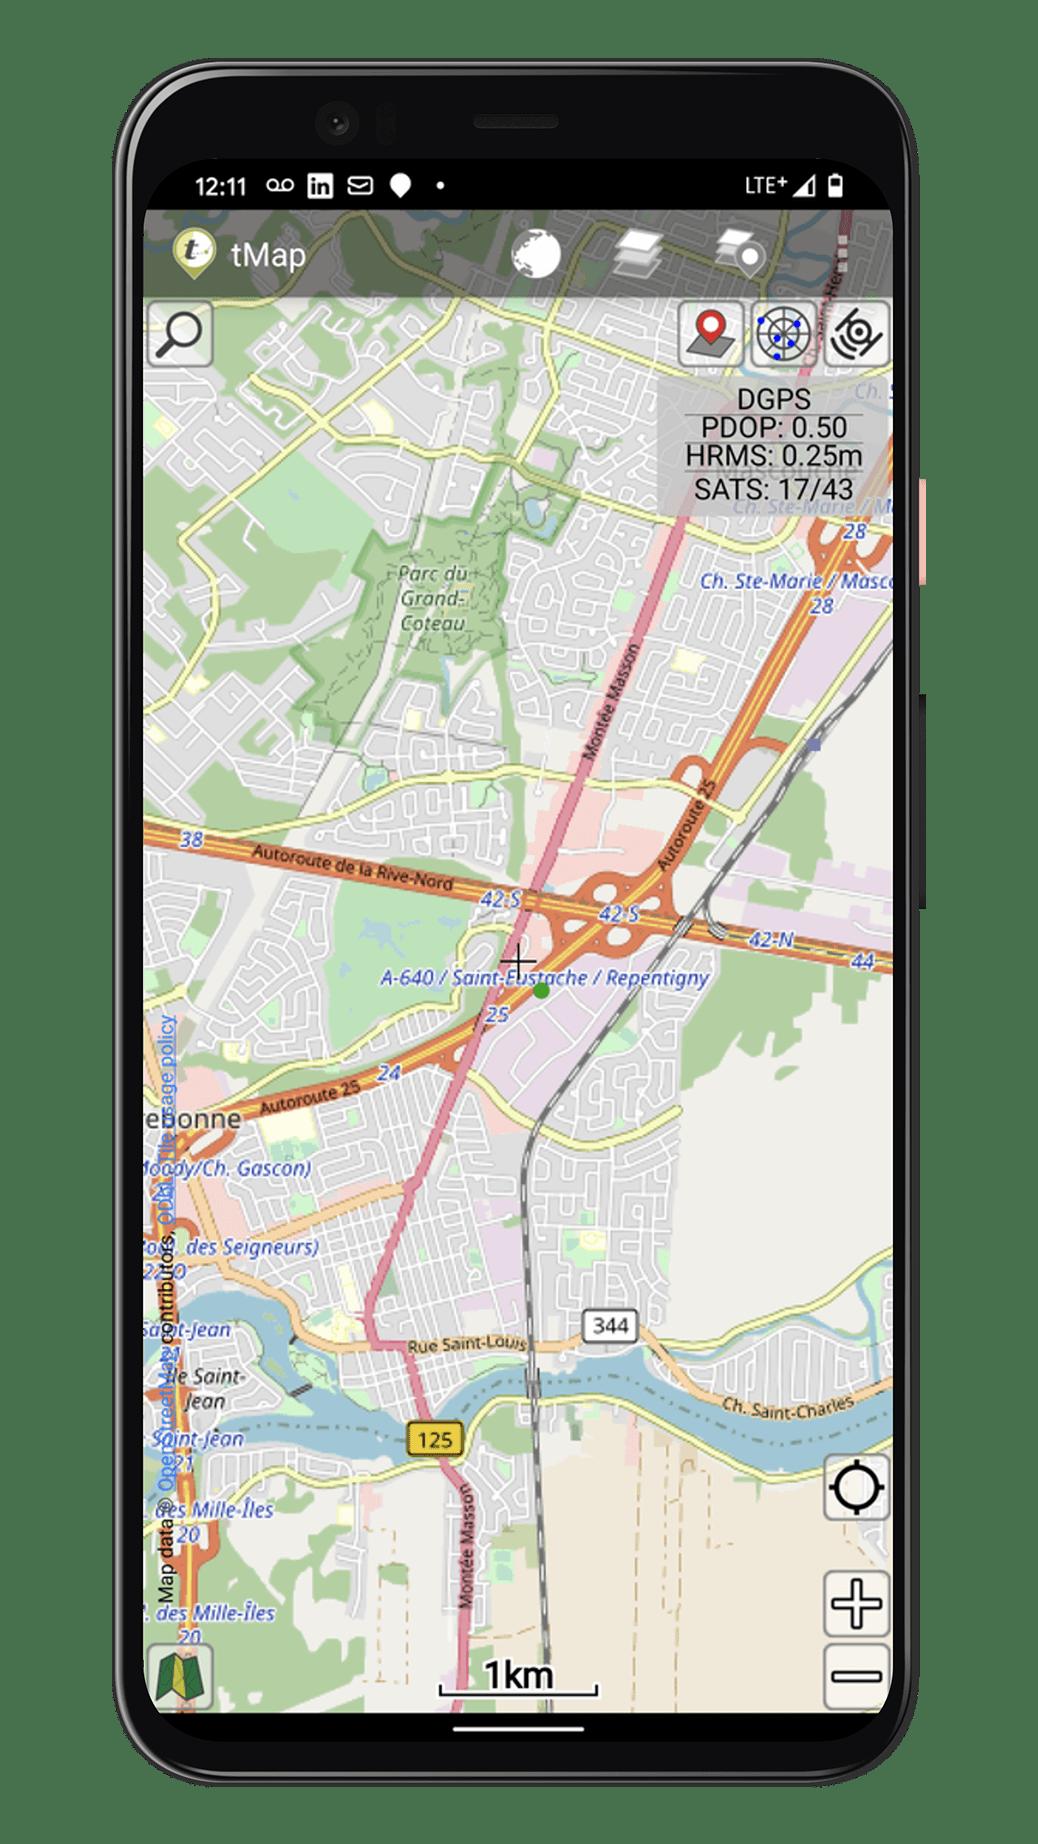 Eos Arrow Partner tMap GNSS GIS GPS data collection